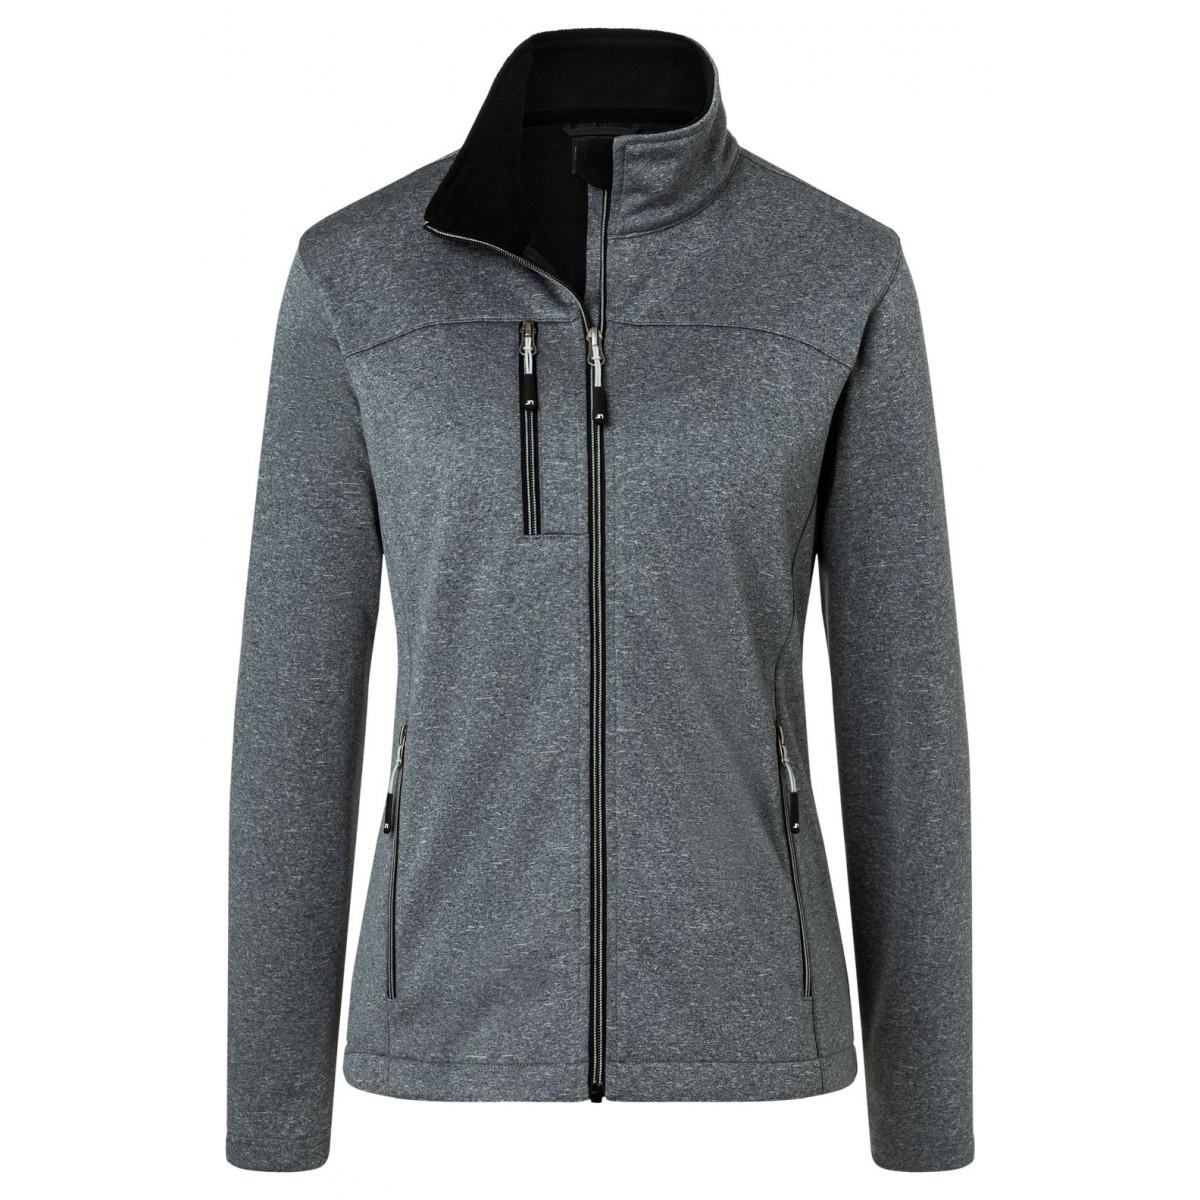 Куртка женская JN1147 Ladies Softshell Jacket - Темно-серый меланж/Черный